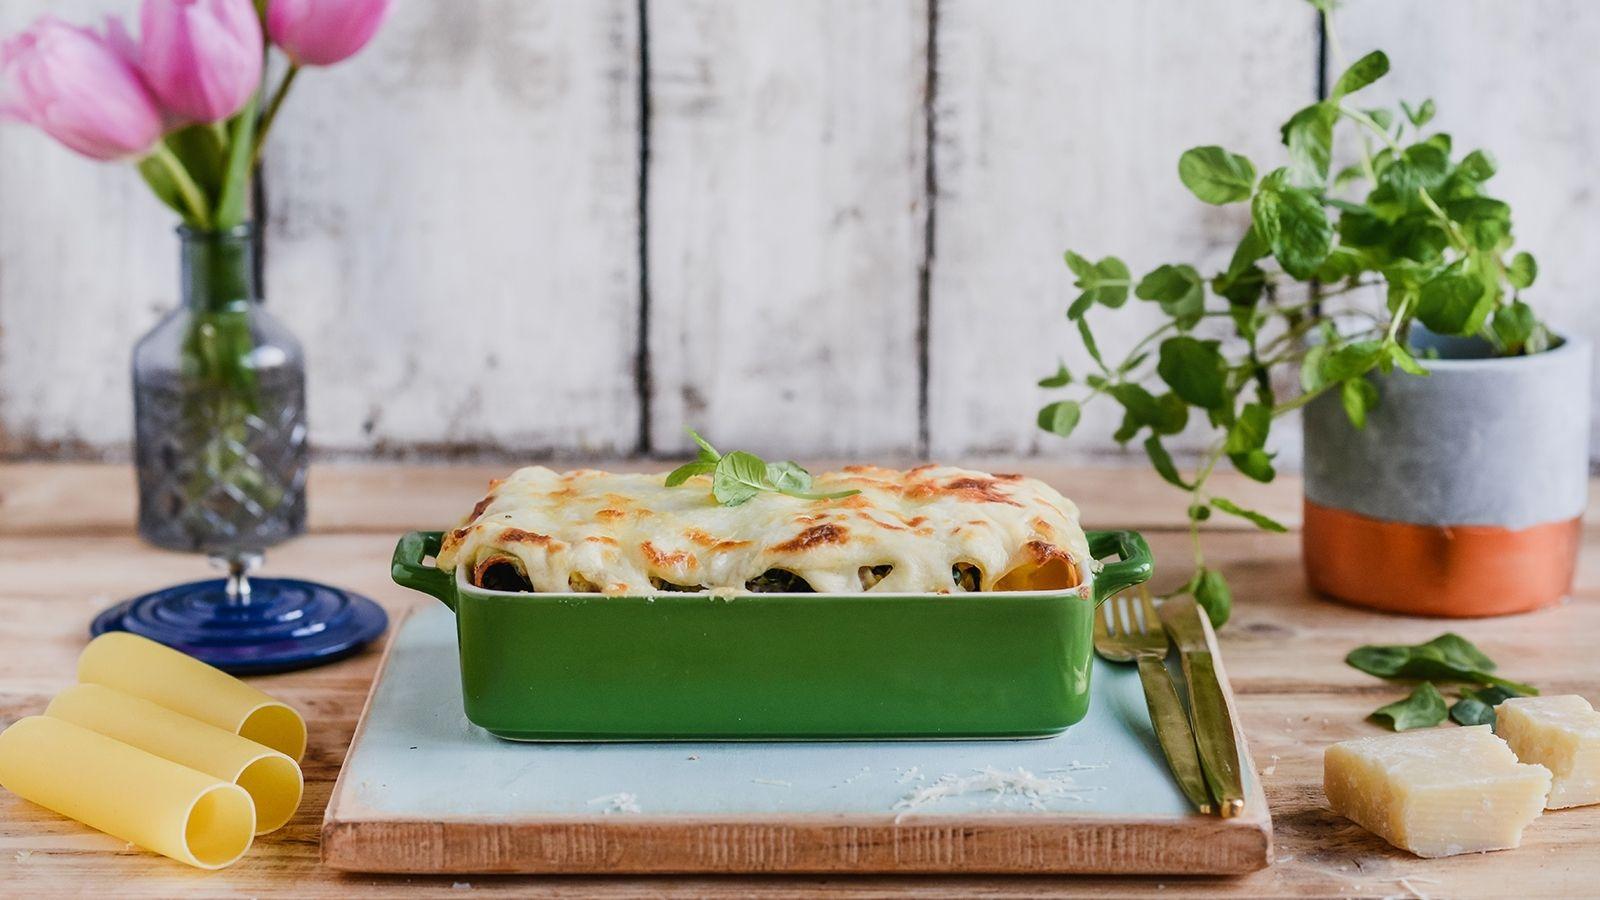 Cannelloni ze szpinakiem, szynką i mozzarellą